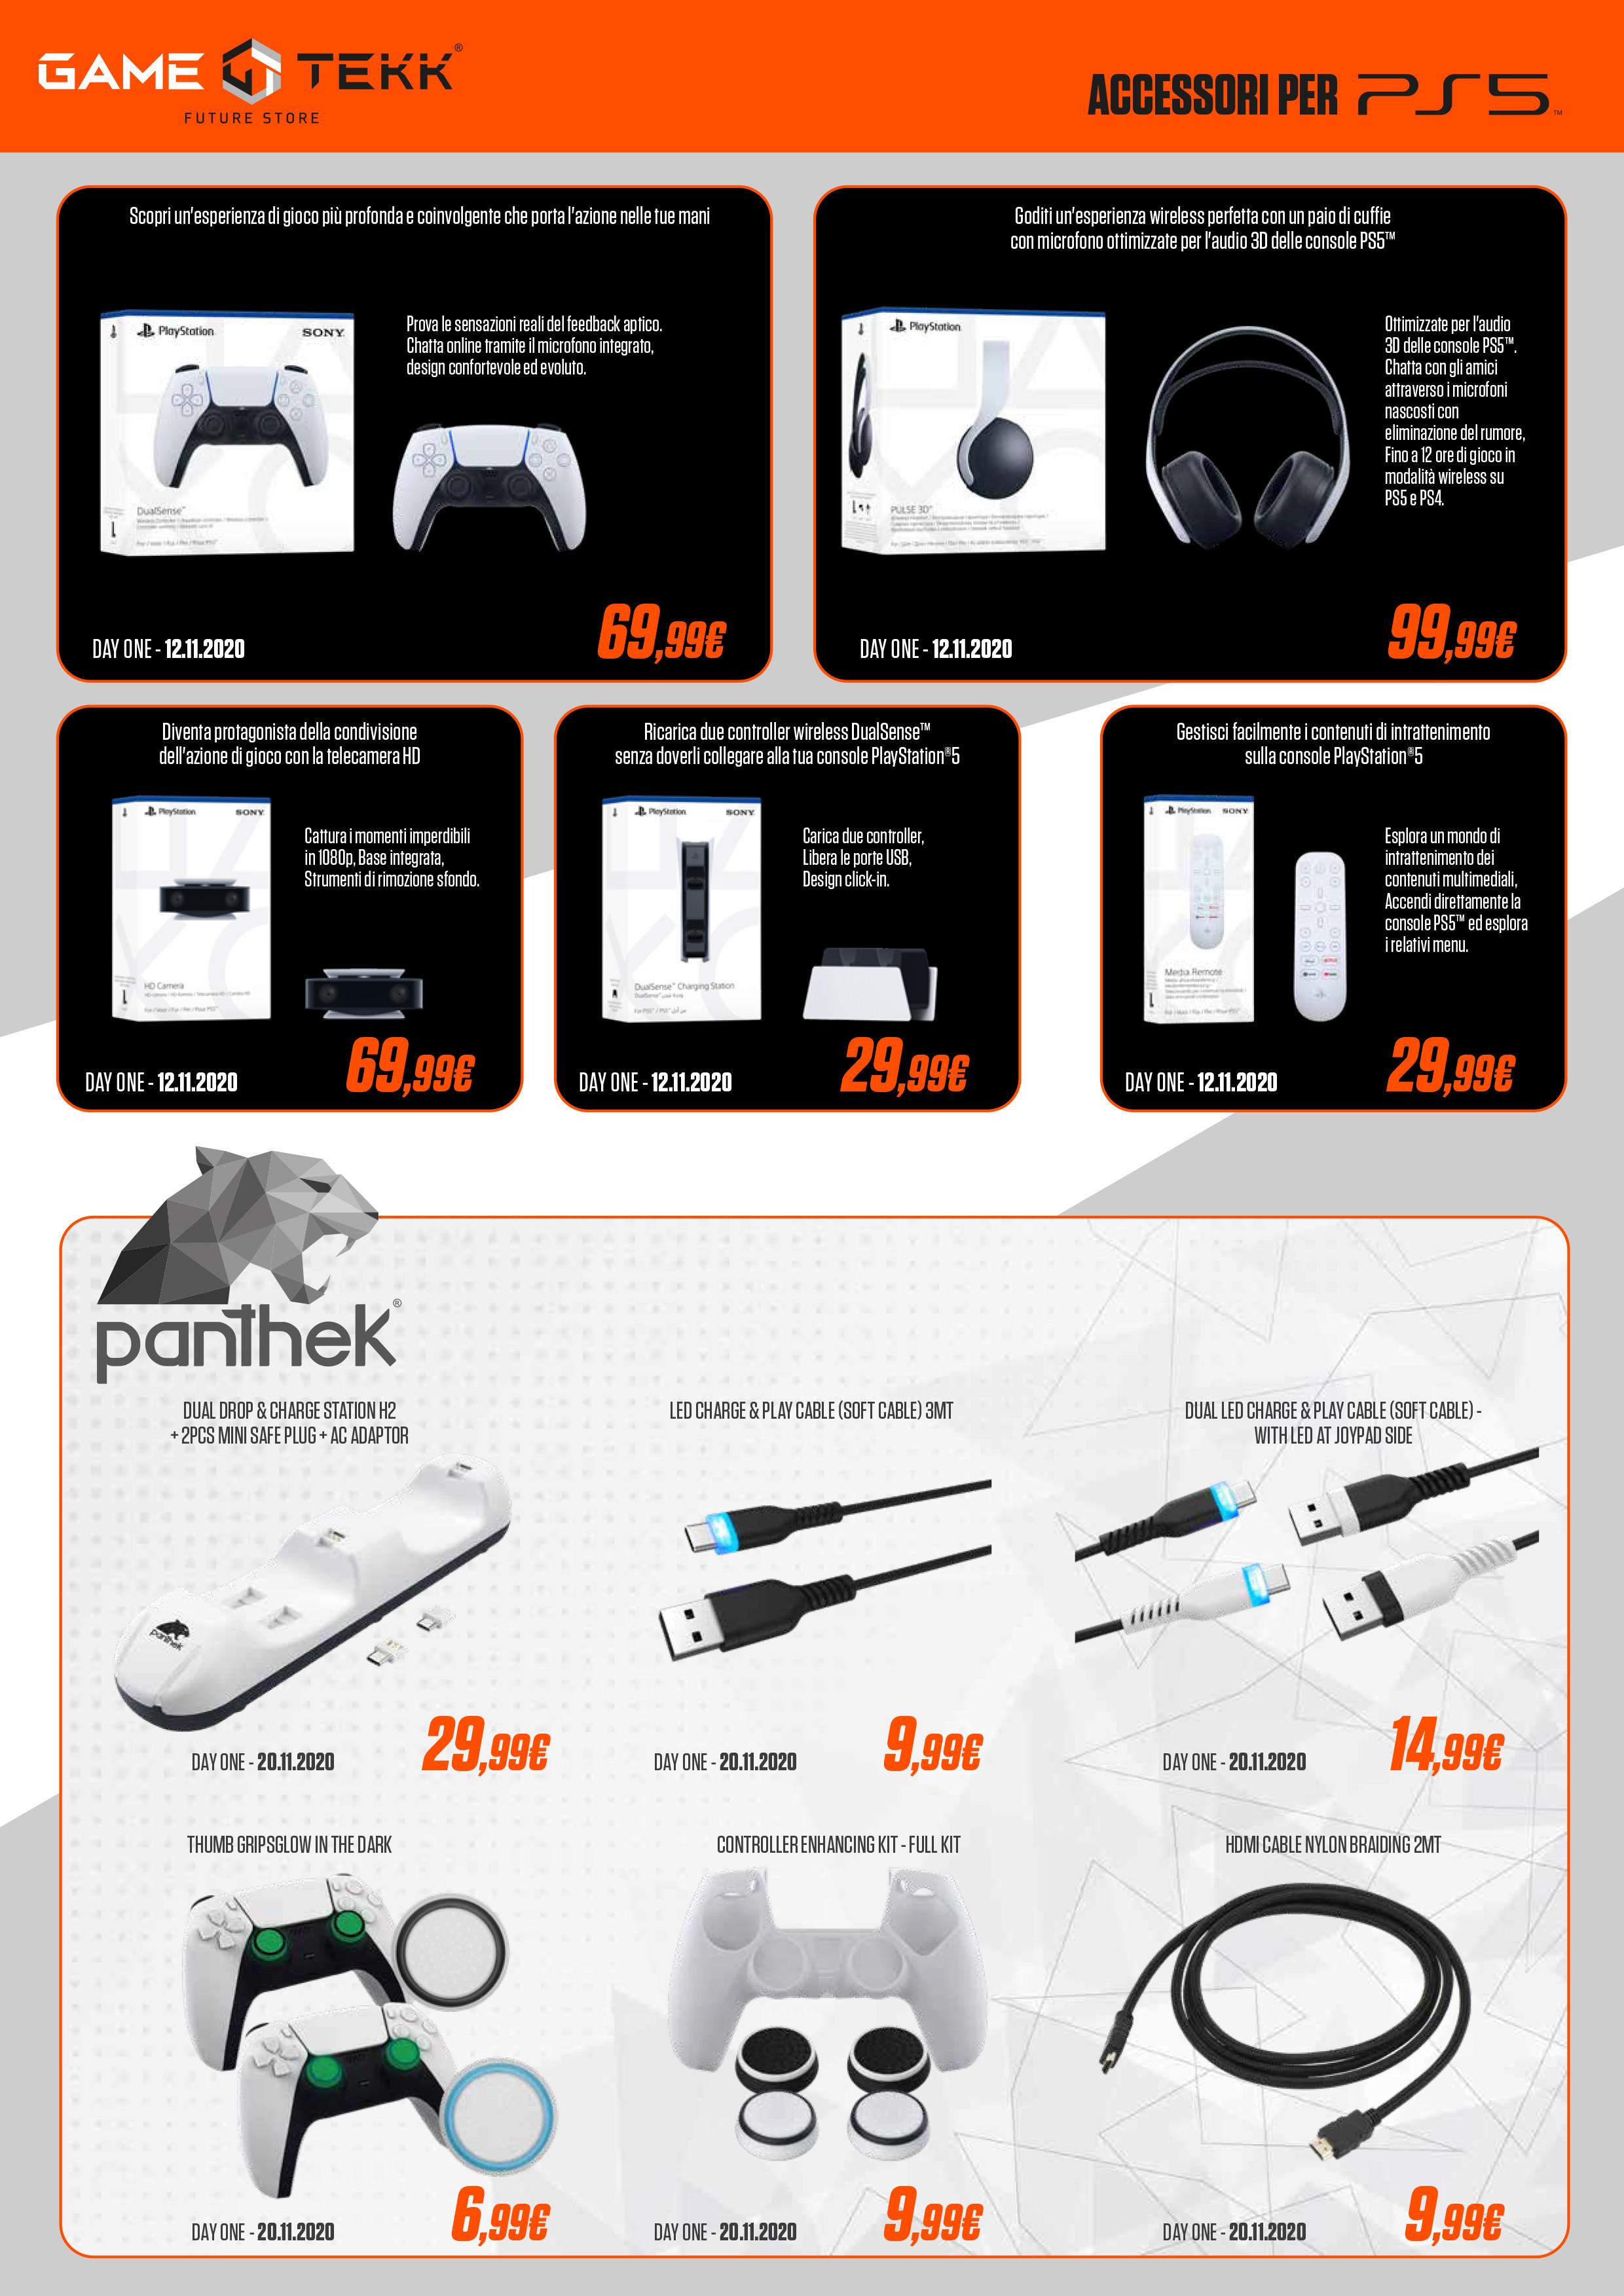 volantino_PS5-4.jpg